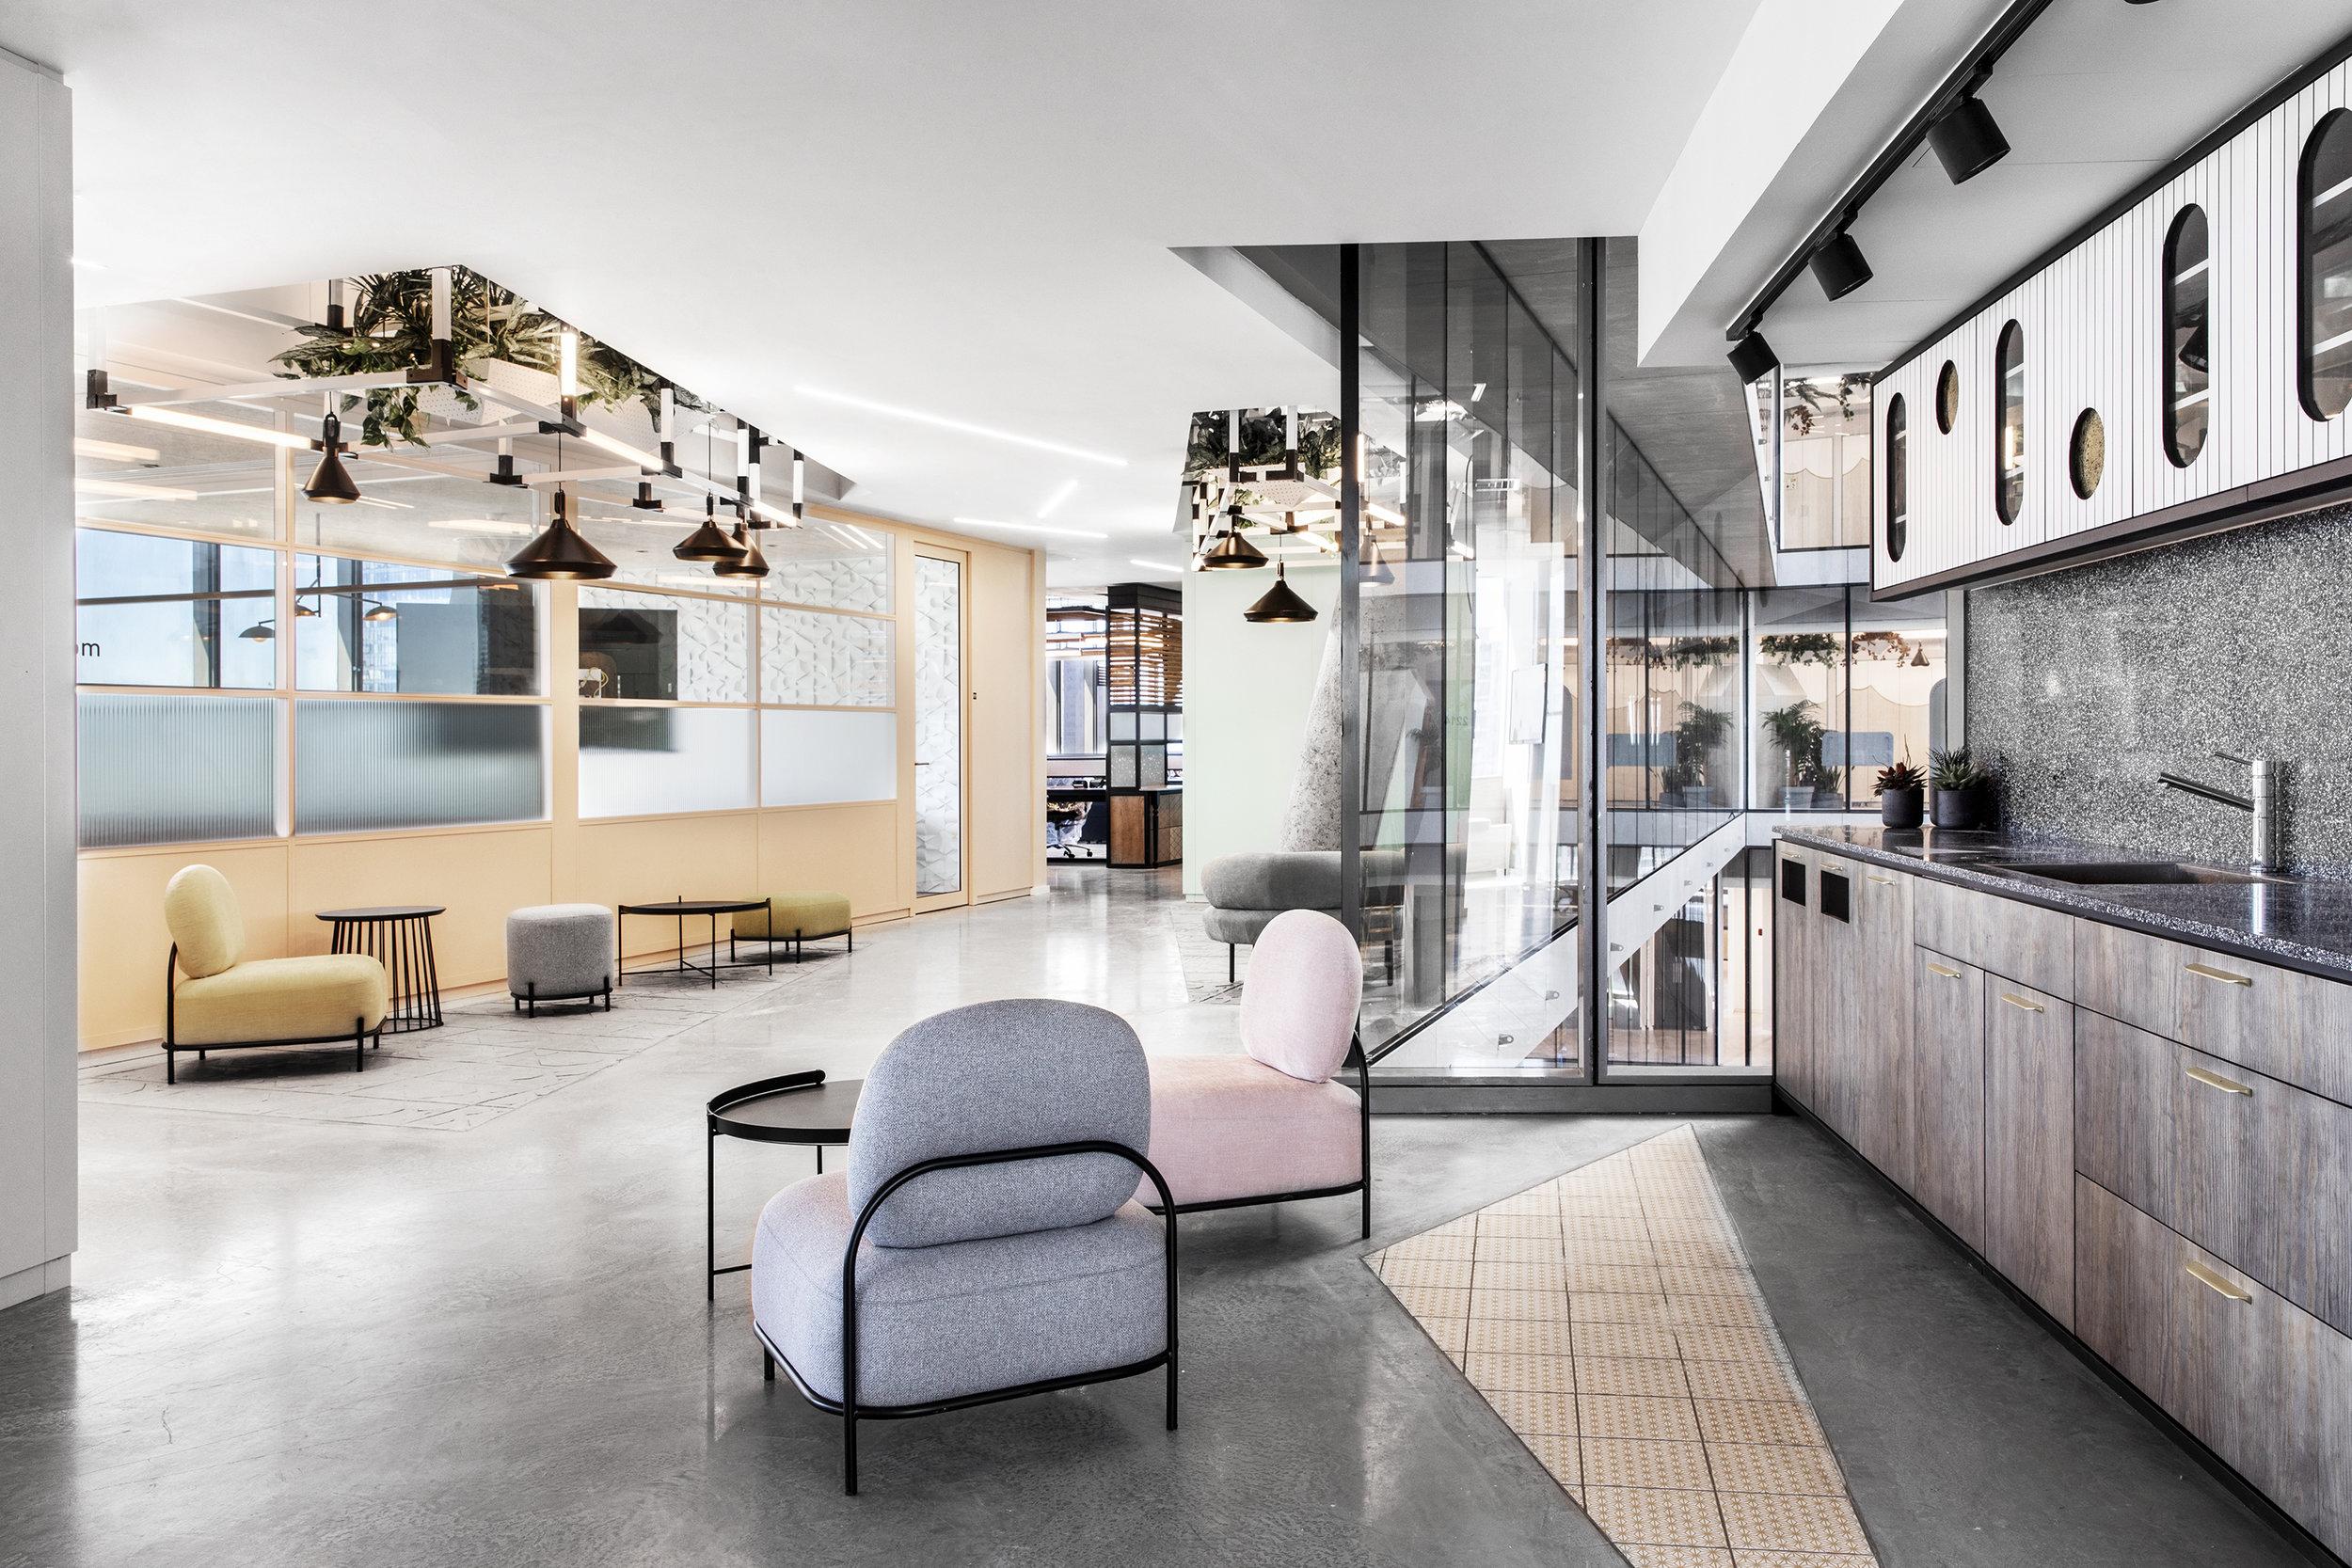 רואי דוד אדריכלות - אדריכל - נטורל אינטליג'נס - ROY DAVID - ARCHITECTURE - ARCHITECT - NI (79).jpg